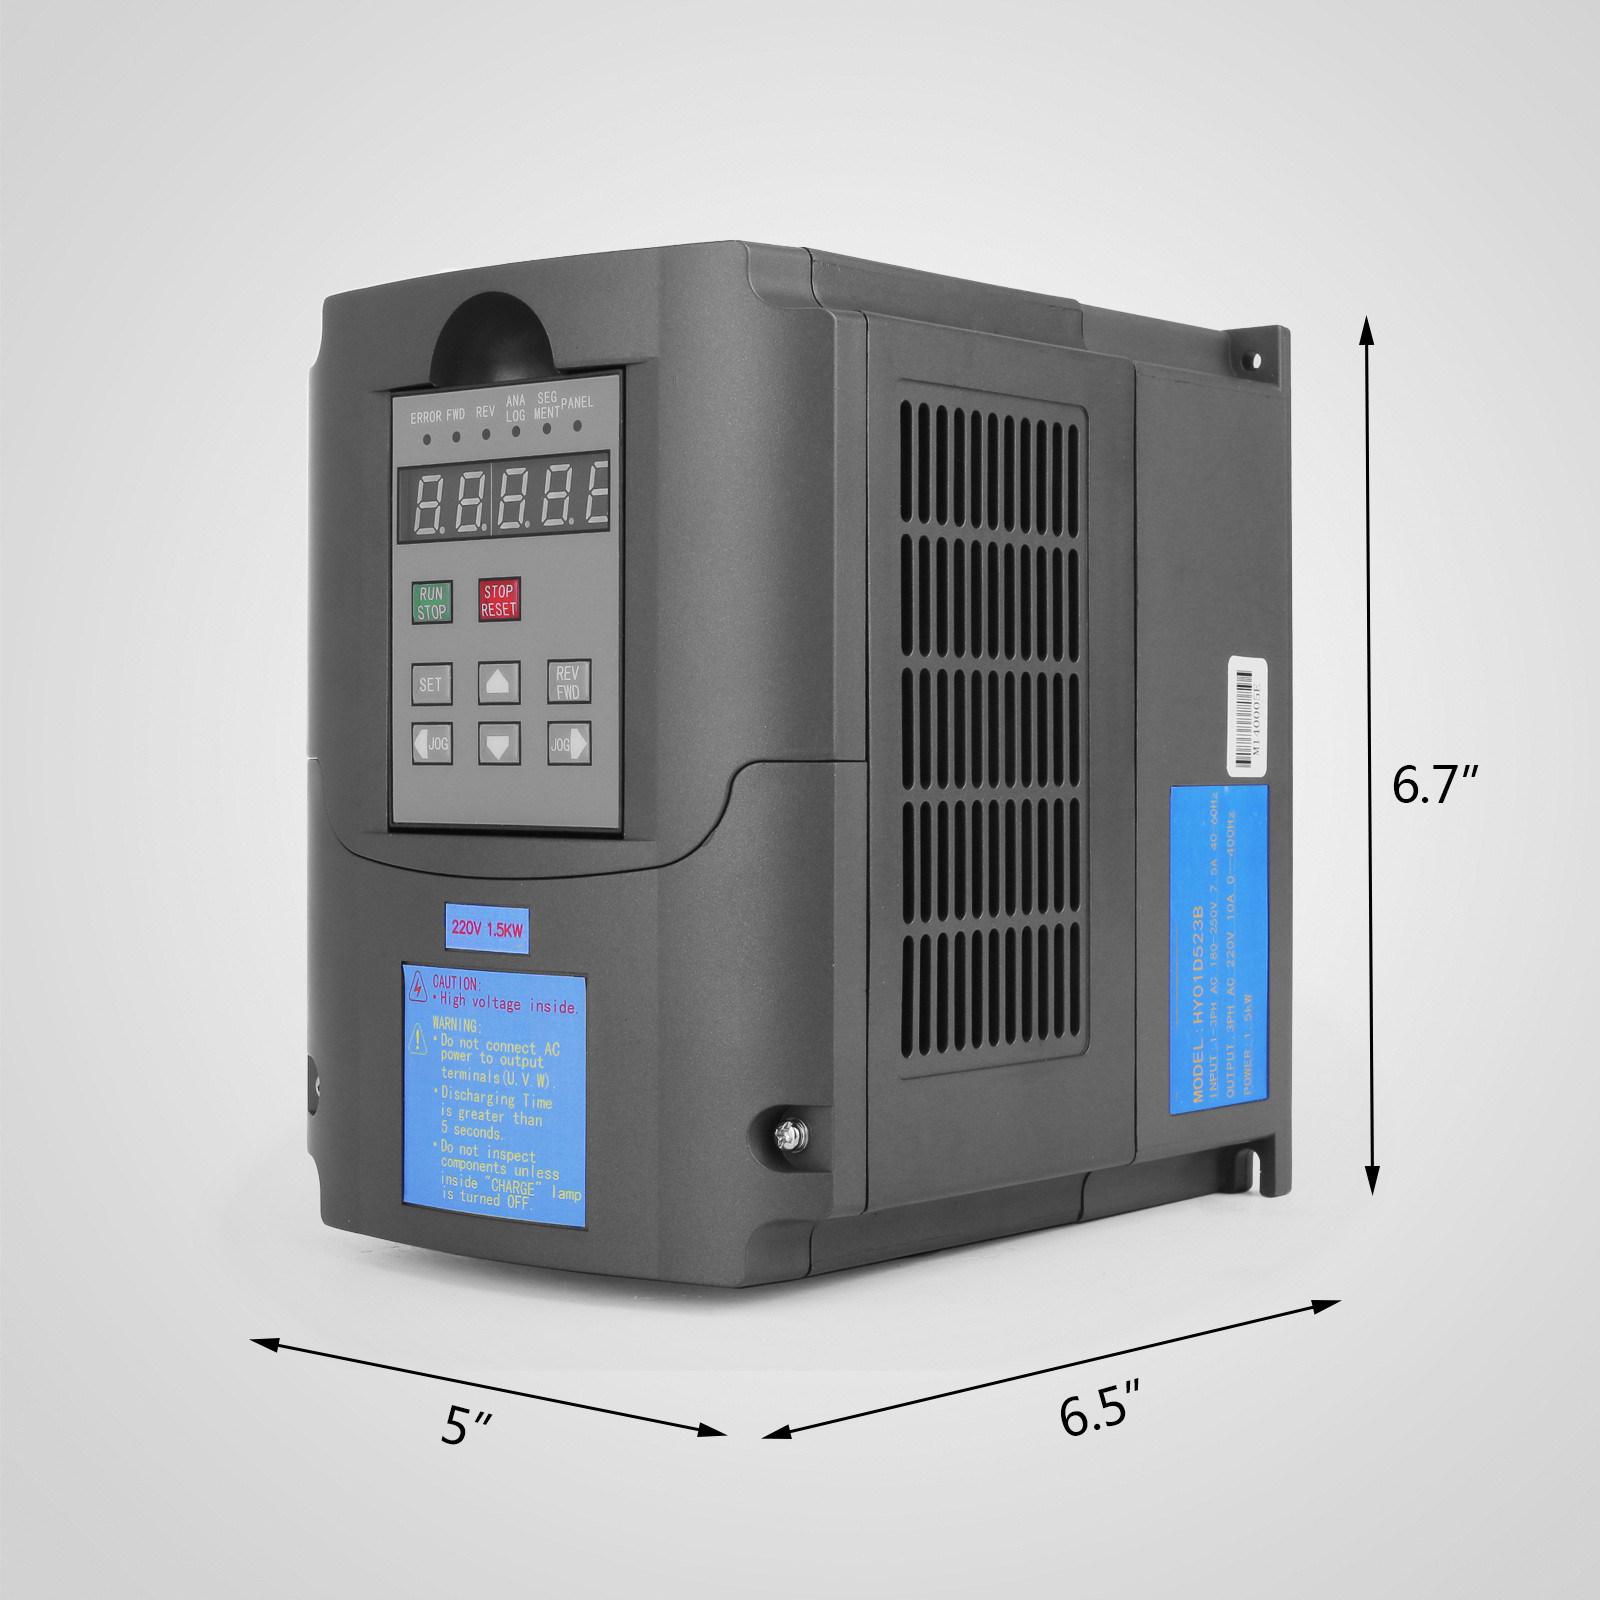 China 4hp 3kw 14a 220 250v Variable Frequency Drive Inverter Vfd 7segdriverinverterwiringdiagramjpg Changer